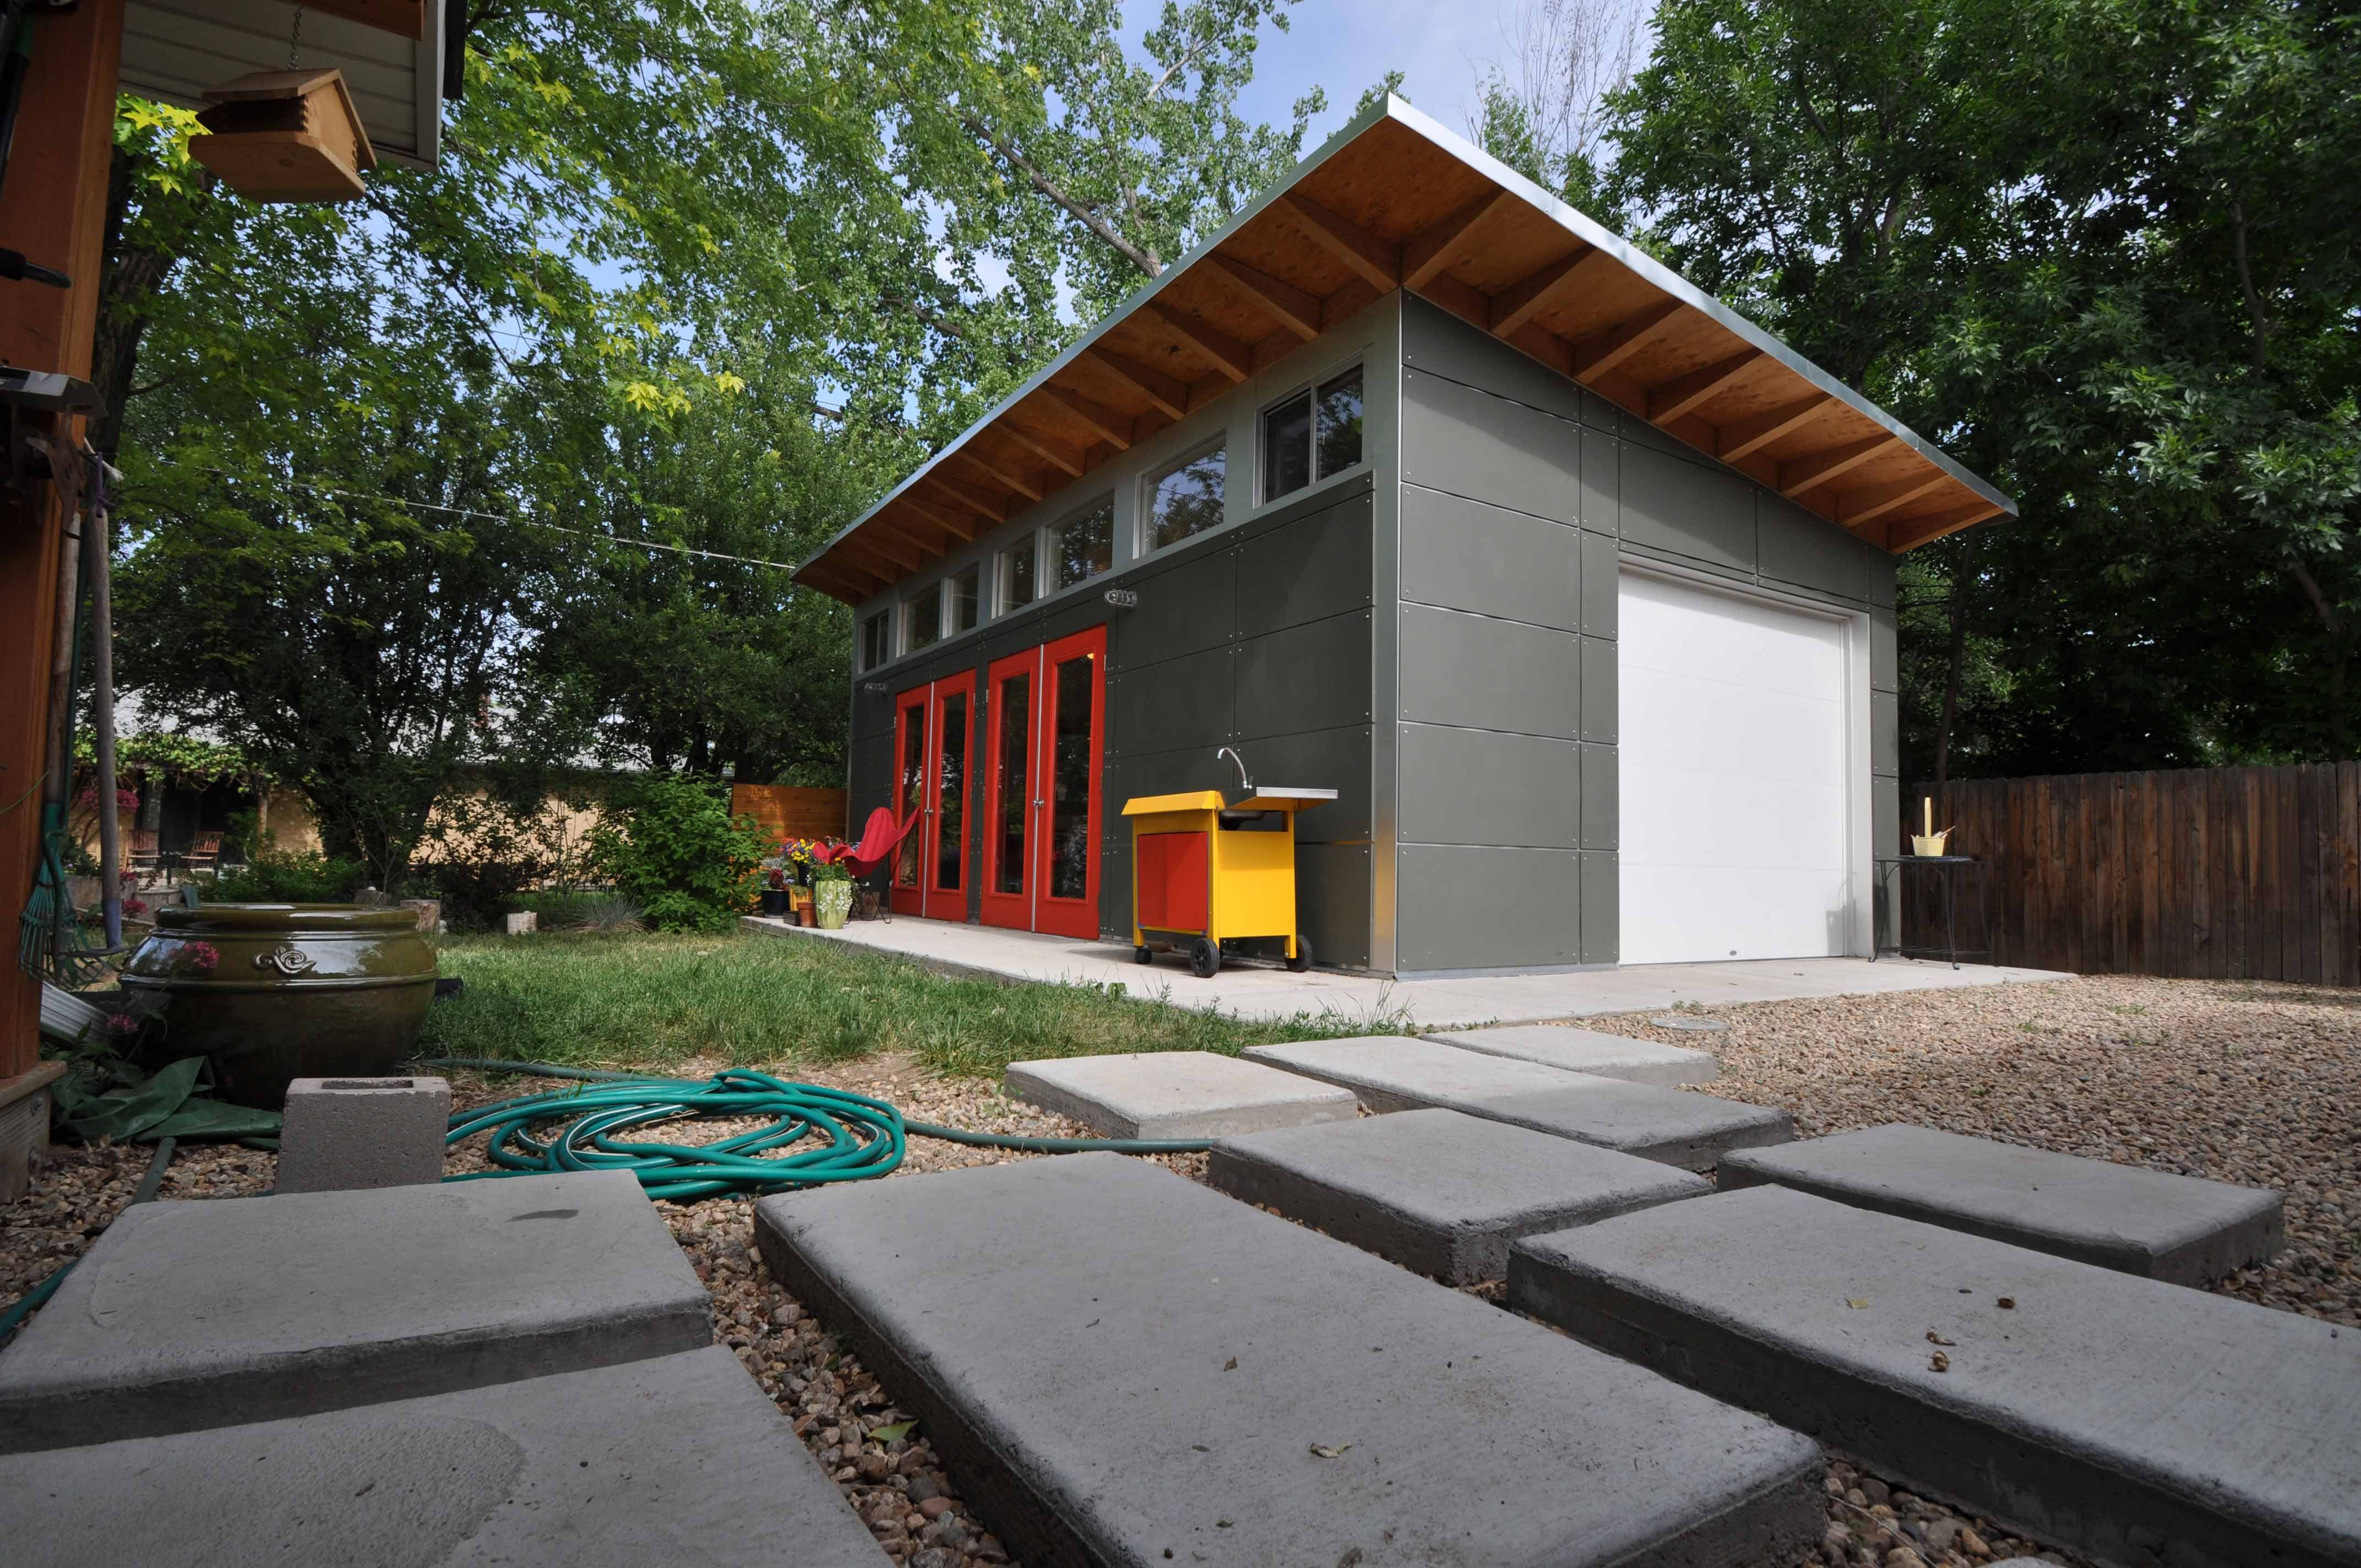 Prefab Backyard Studio U0026 Home Office Sheds | Plan U0026 Design Your Own Modern  Custom Studio